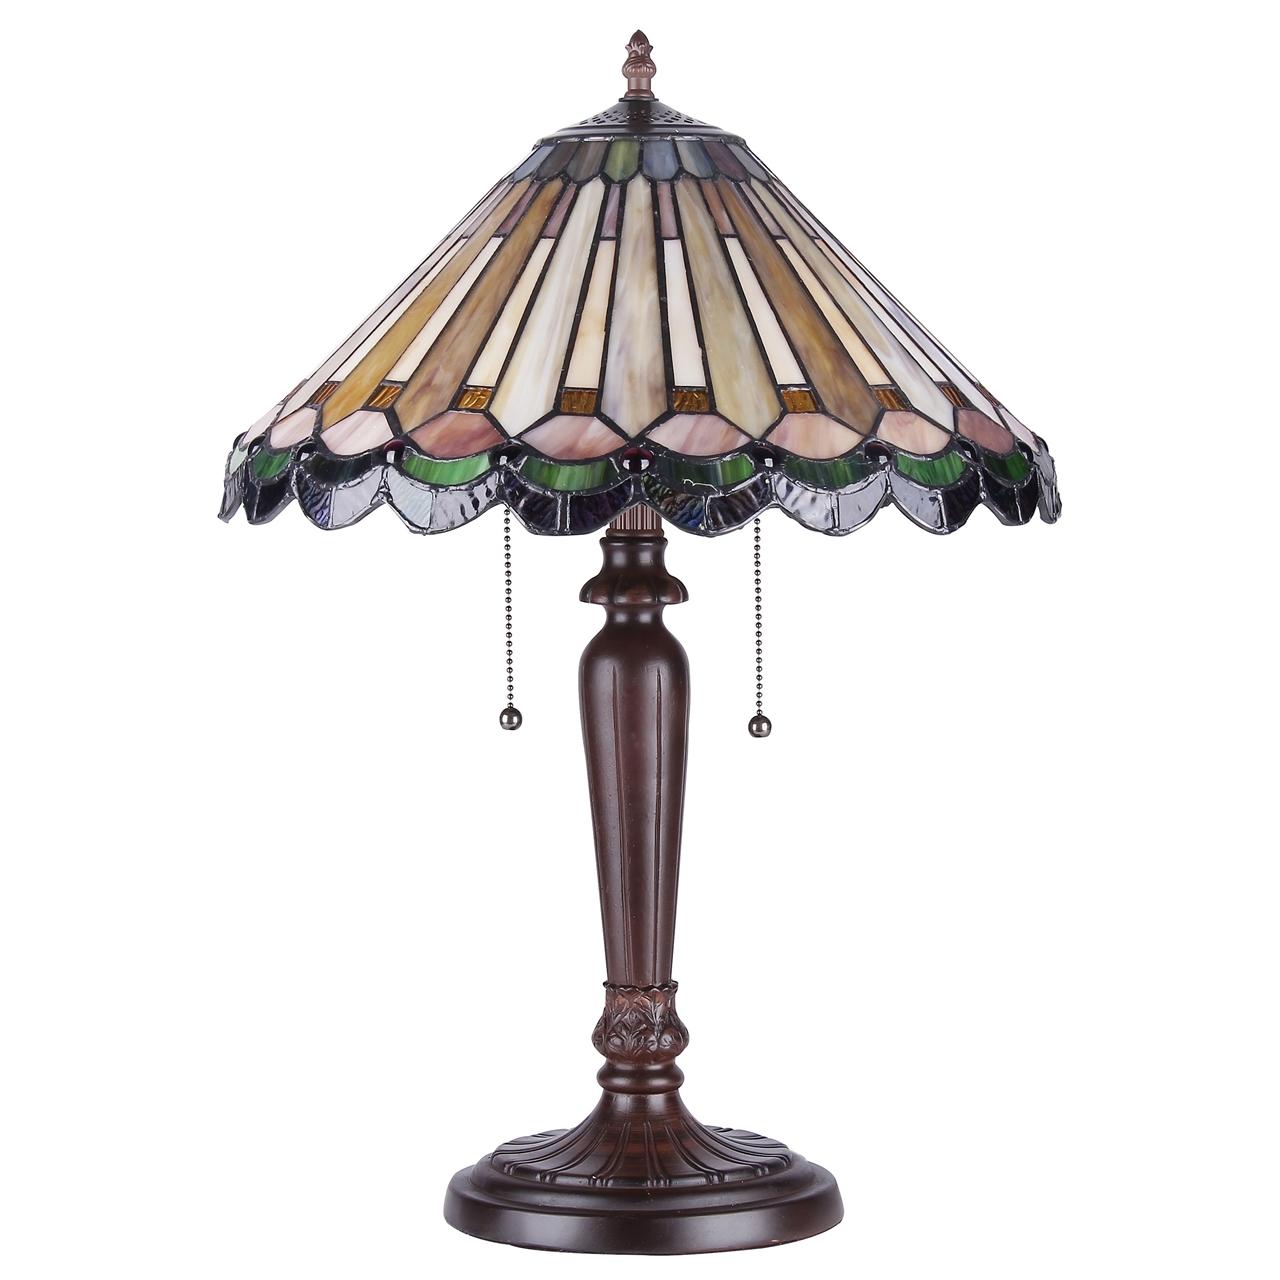 Chloe Lighting Inc Tiffany Lamp Tiffany Lamps Tiffany Style Lamp Tiffany Style Lamps